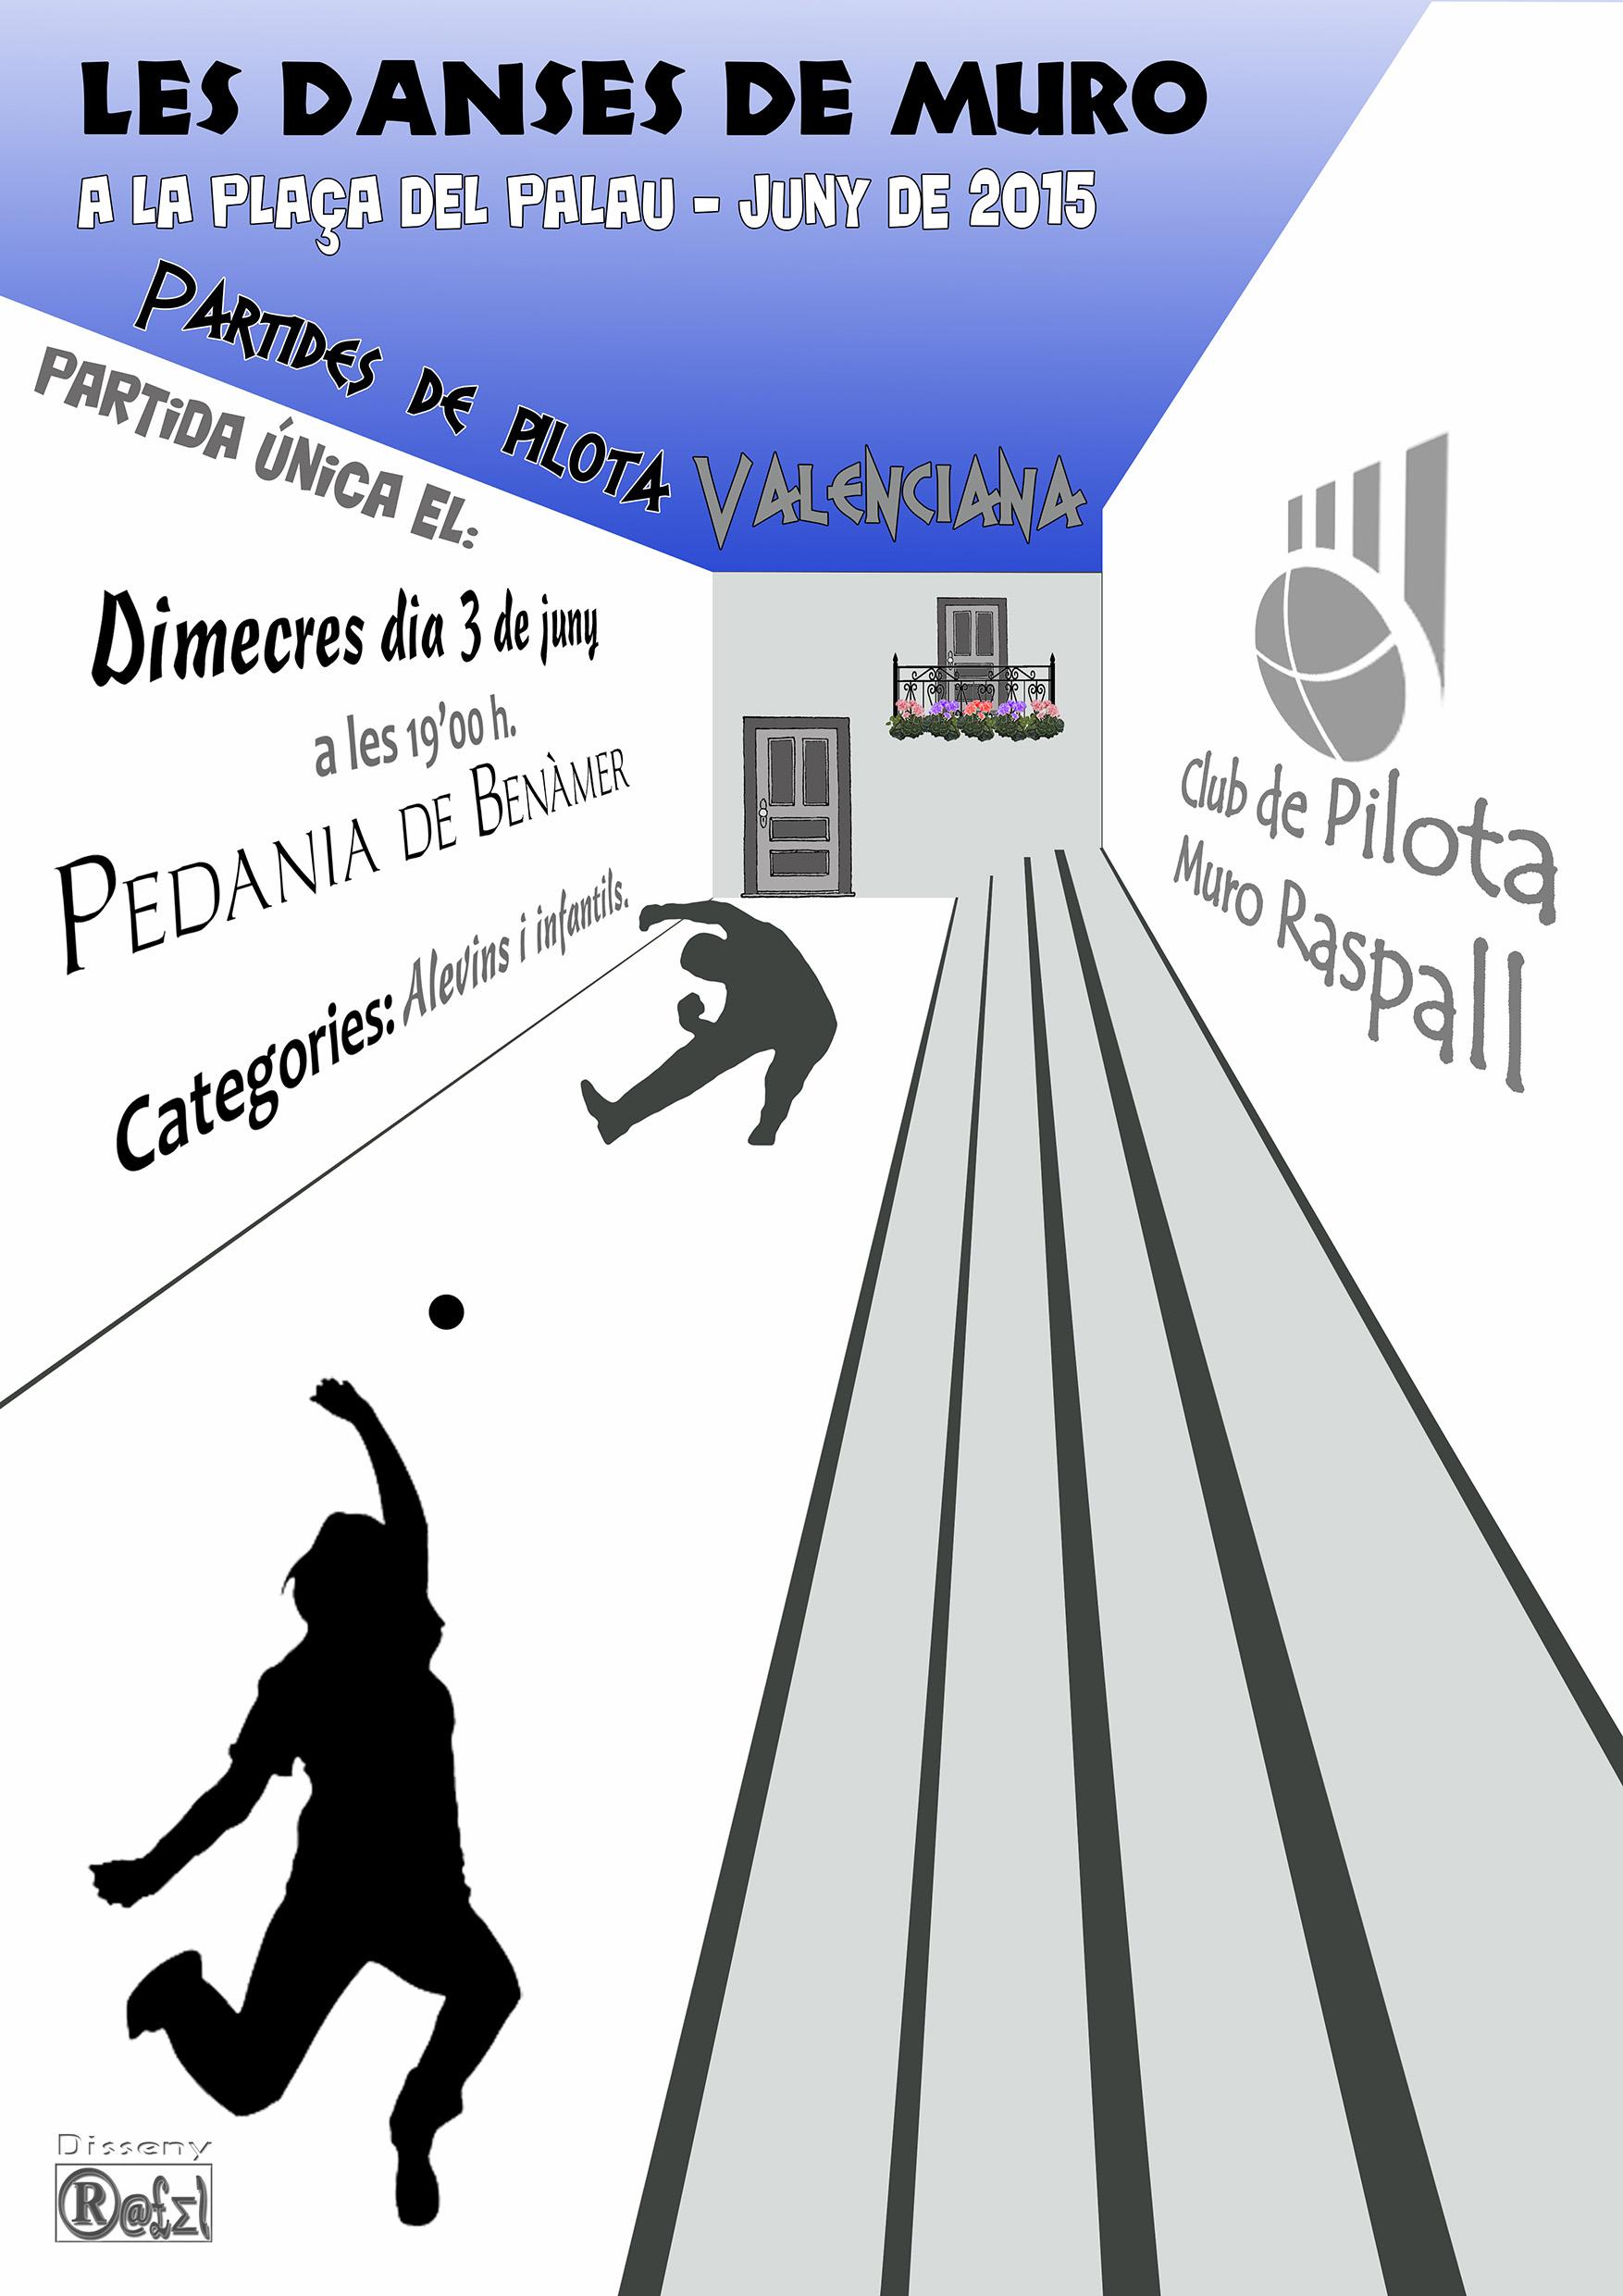 Piolta Valenciana - Palacio 2014